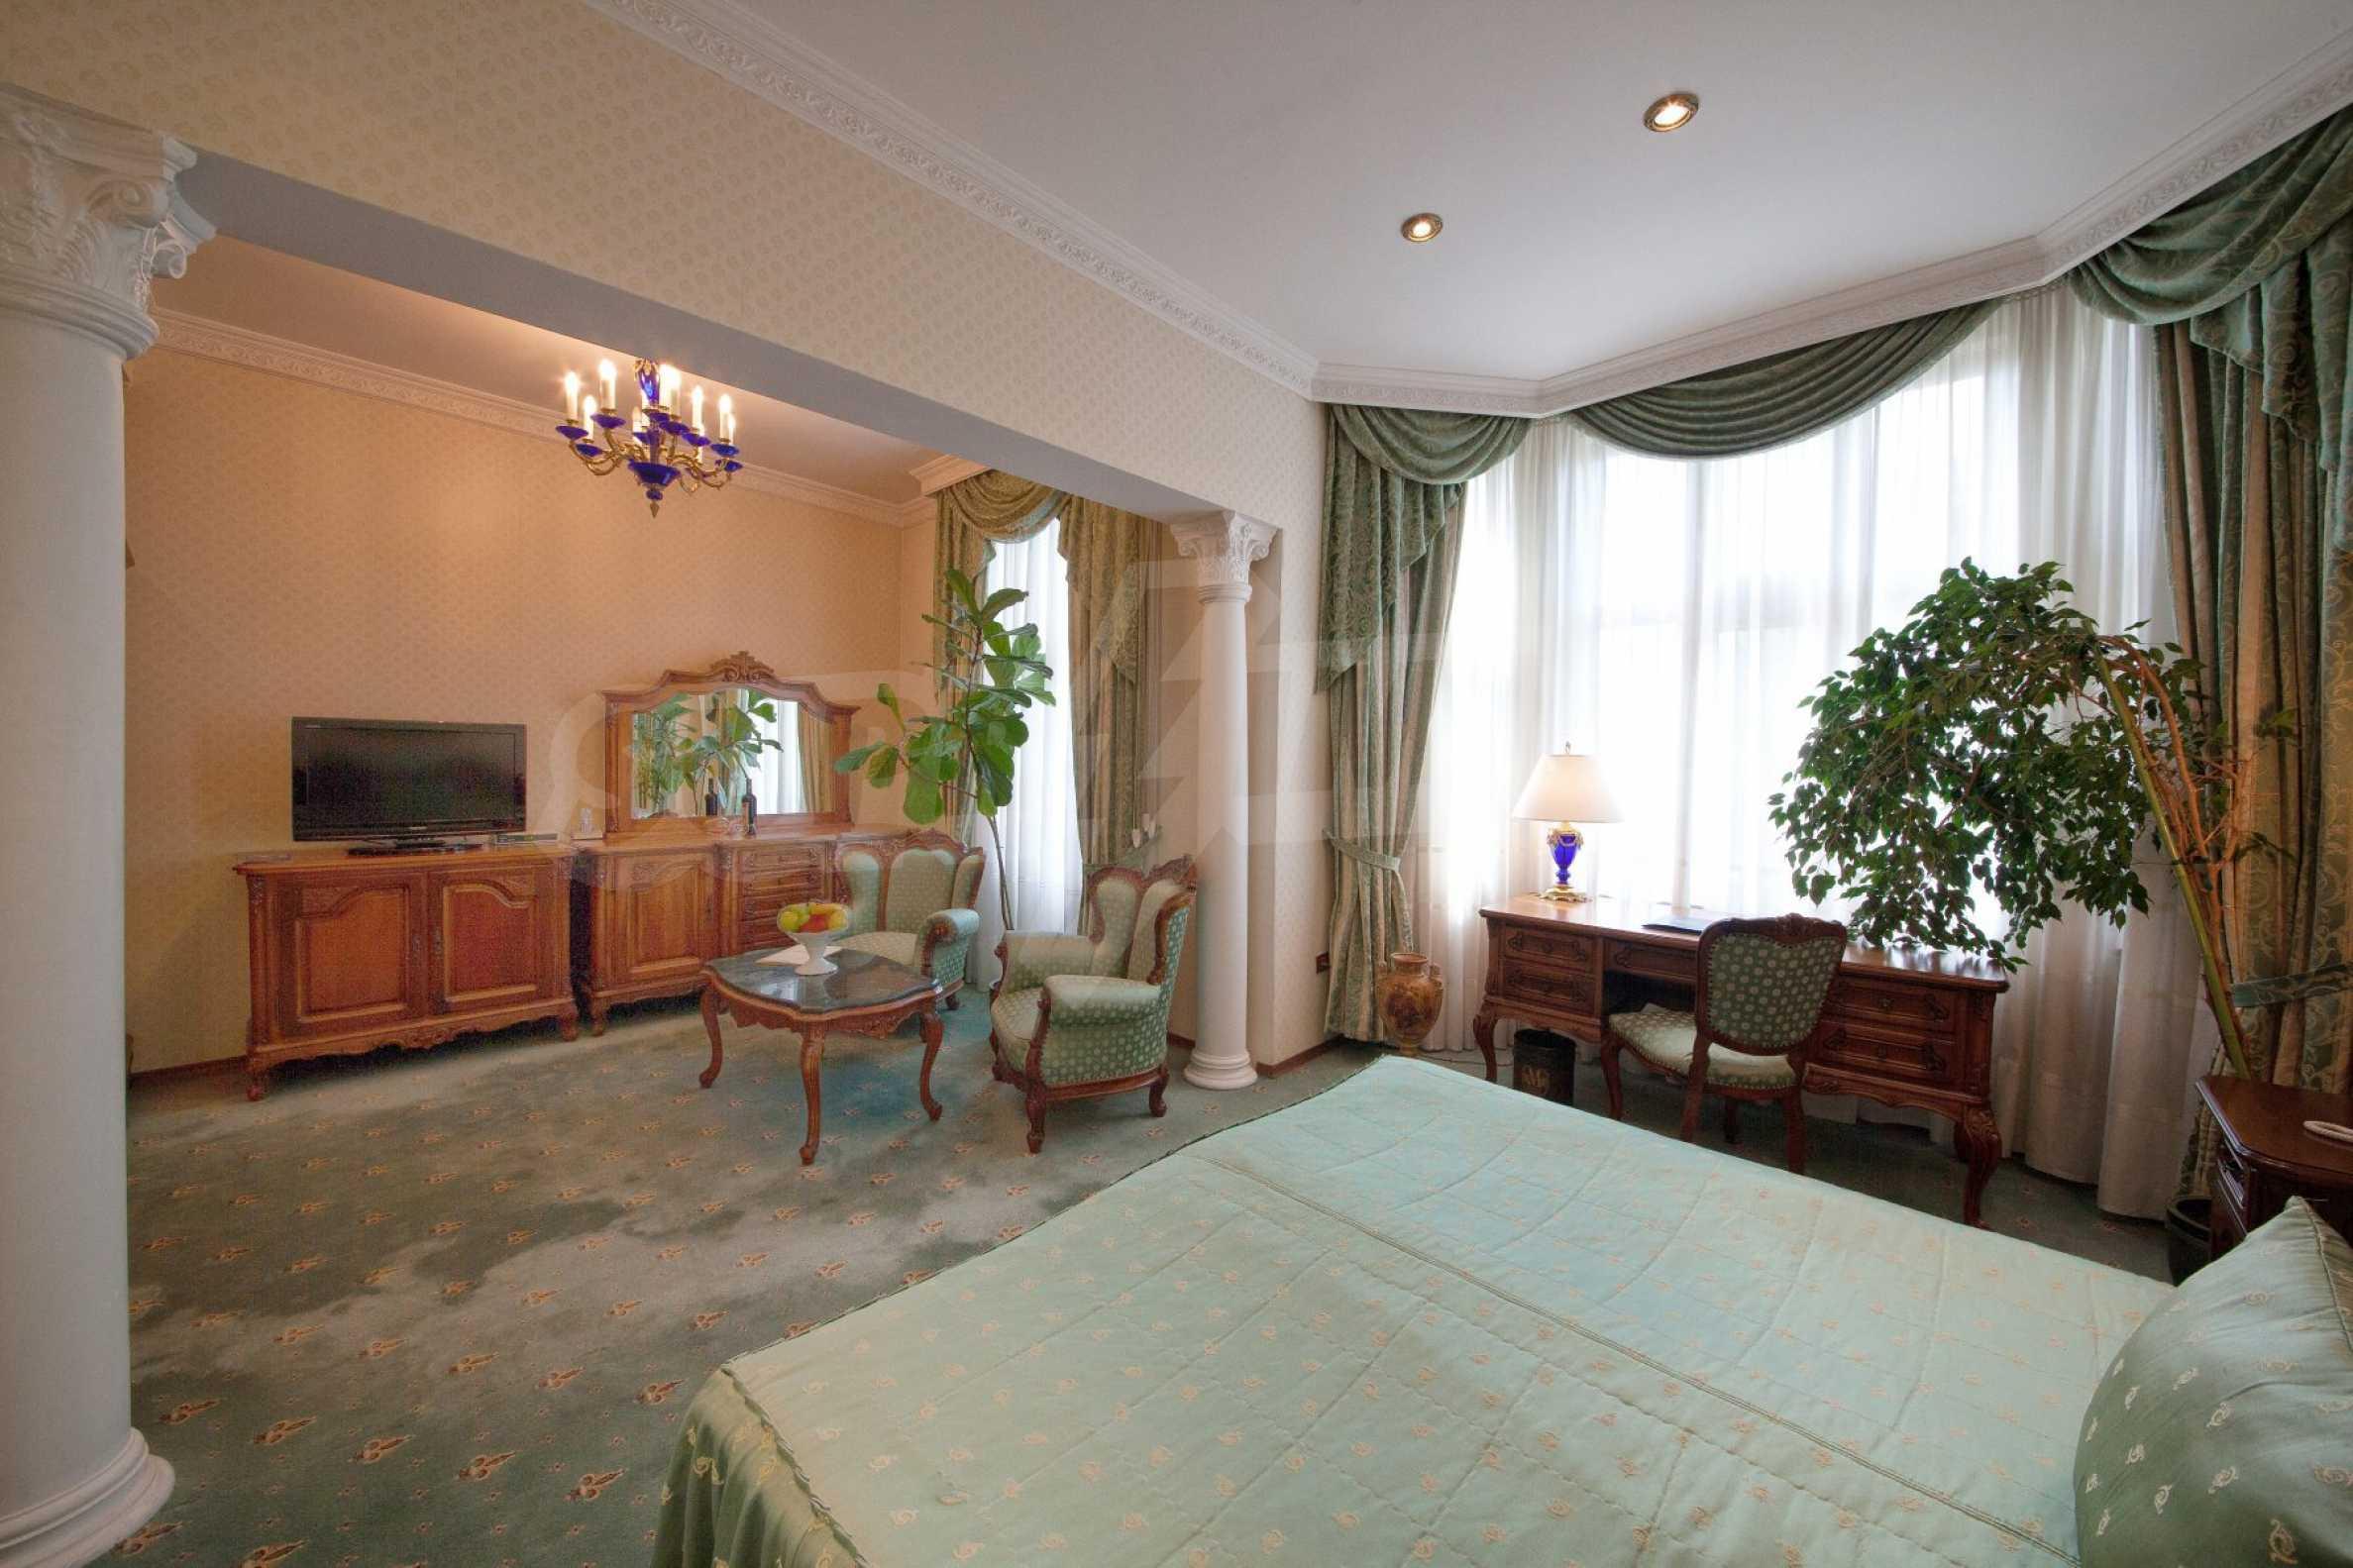 Fünf-Sterne-Hotel 10